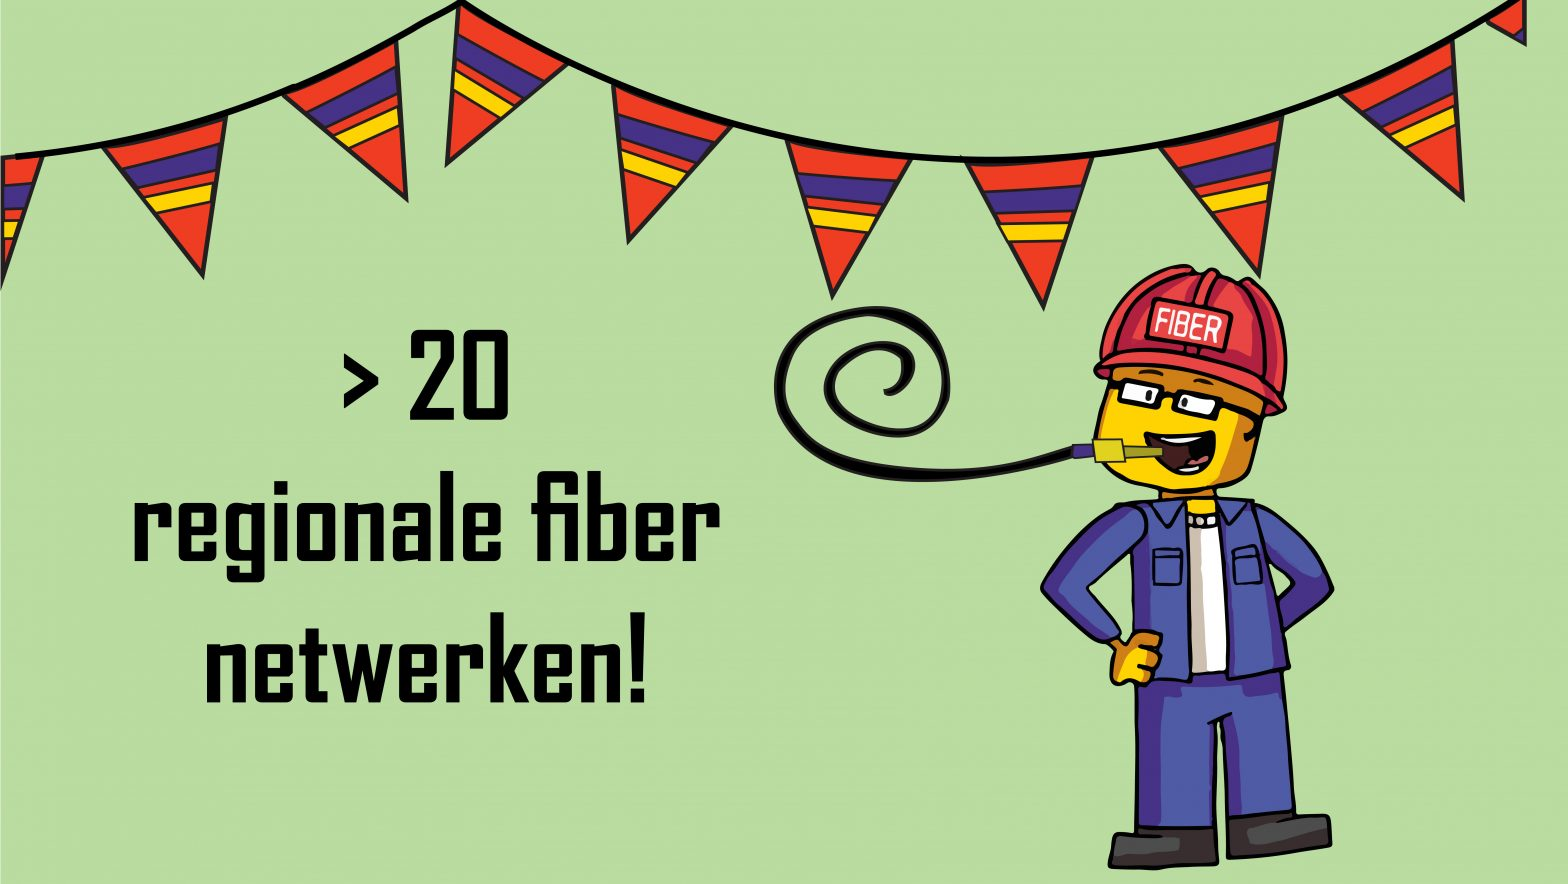 regionale-fiber-netwerken